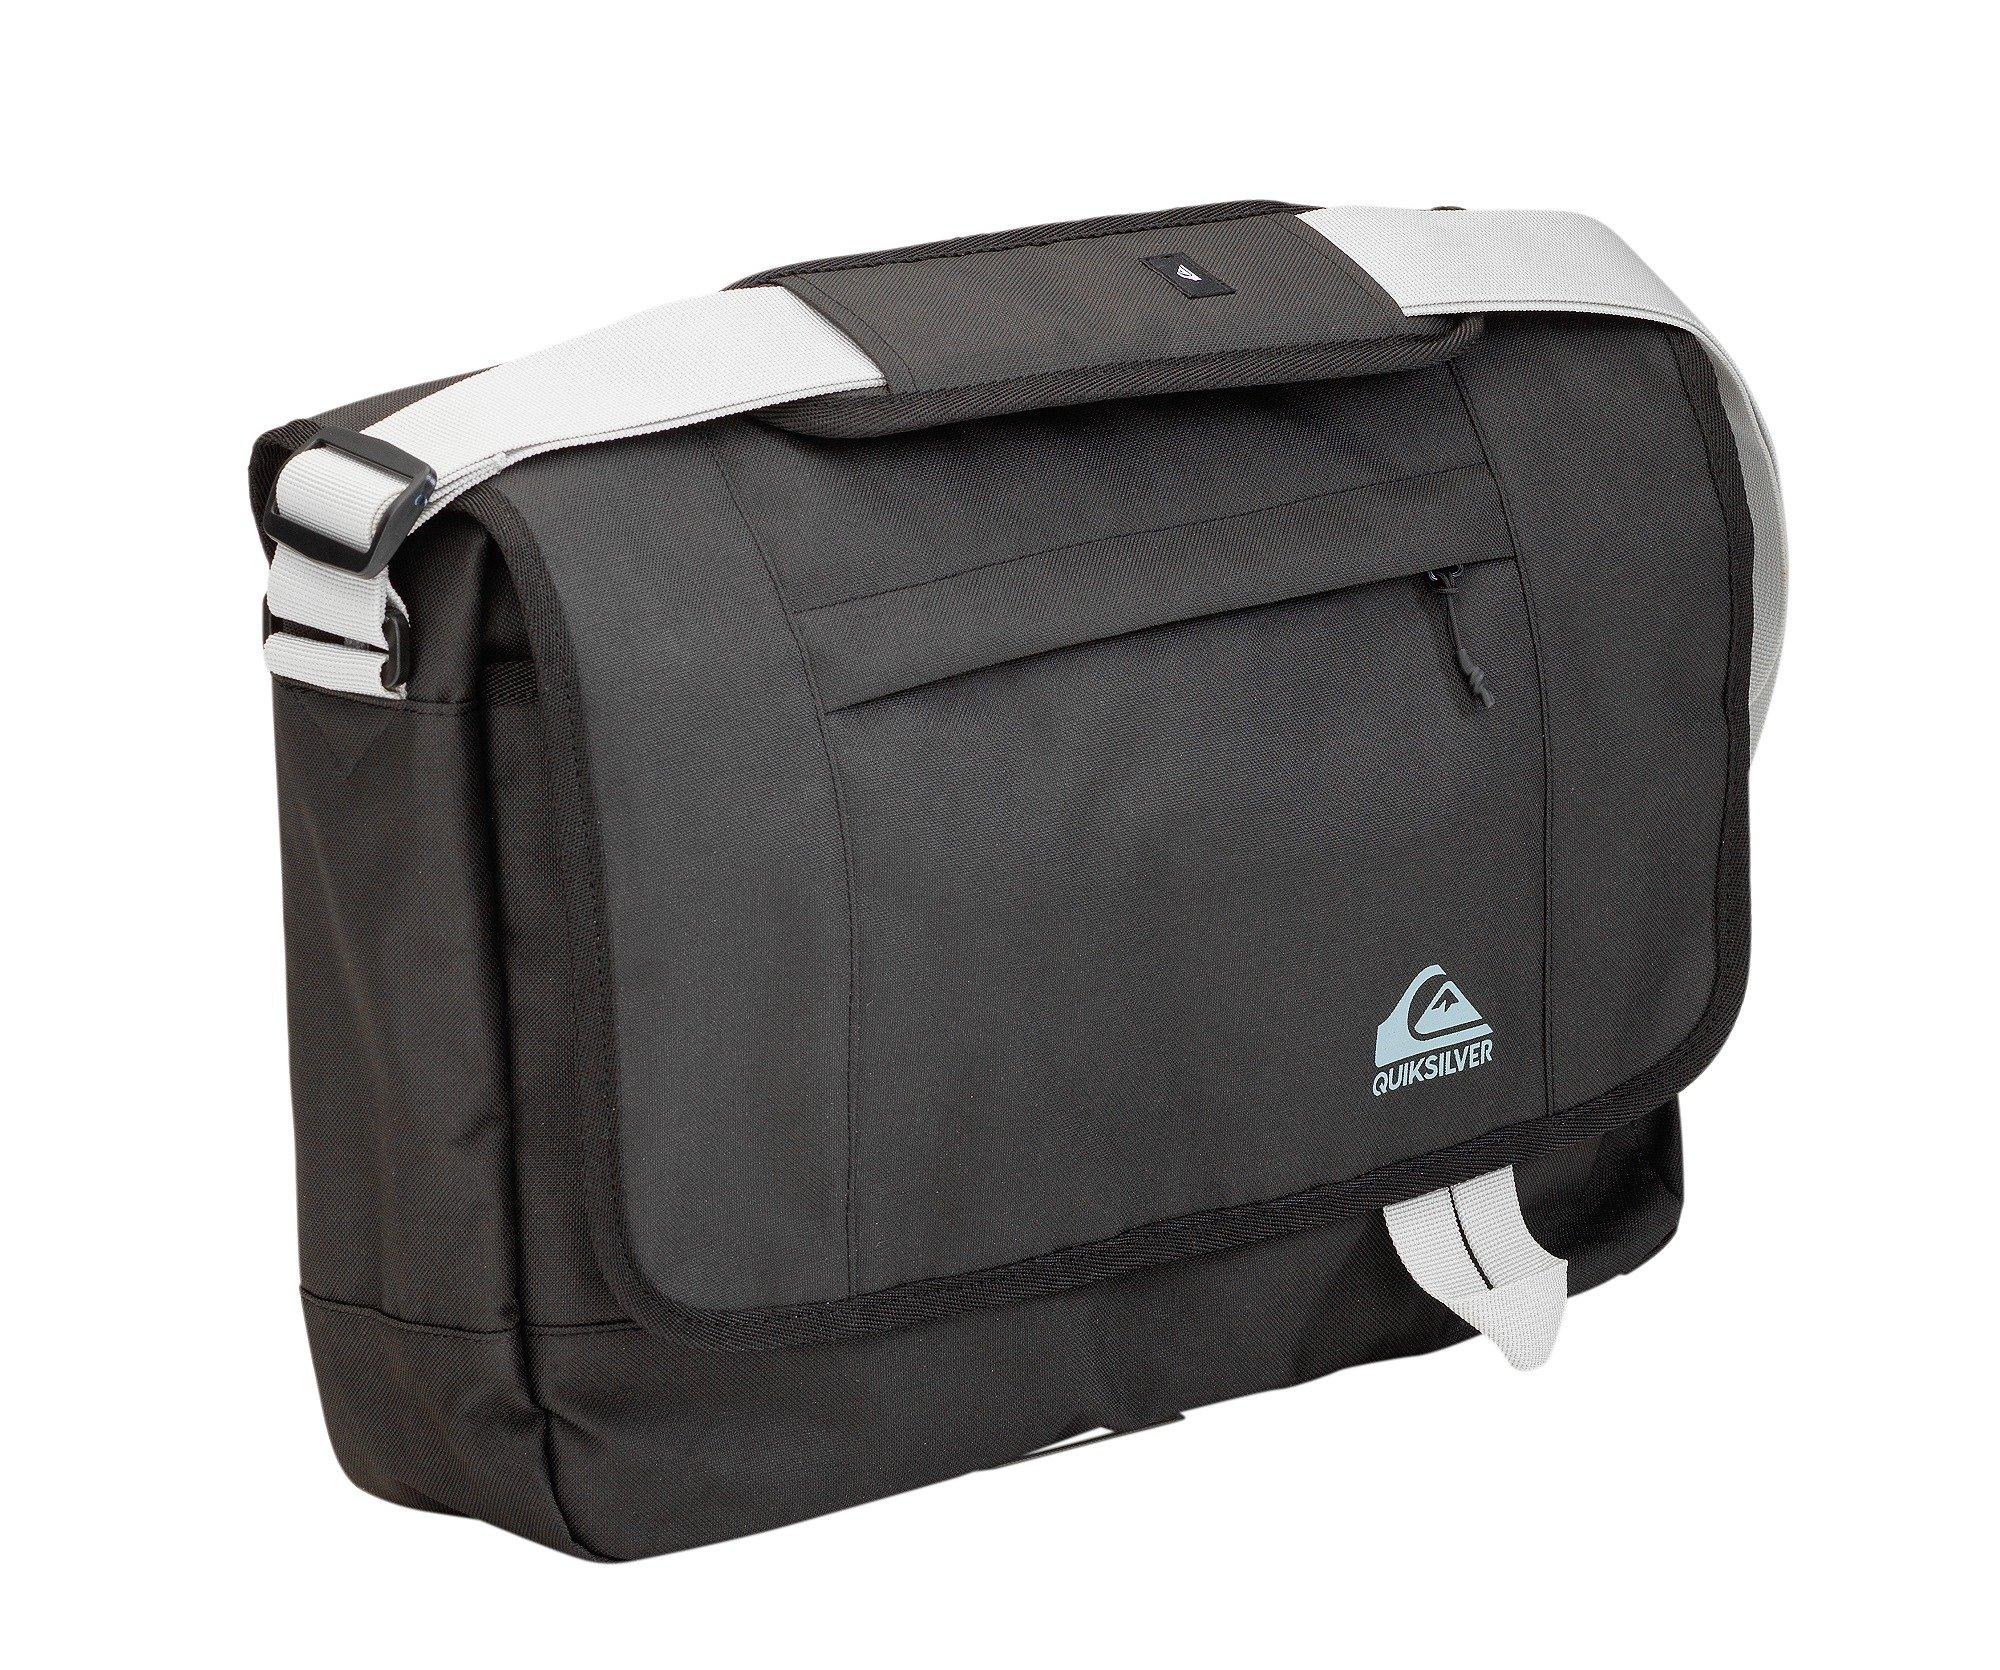 Quiksilver - Messenger Bag - Black